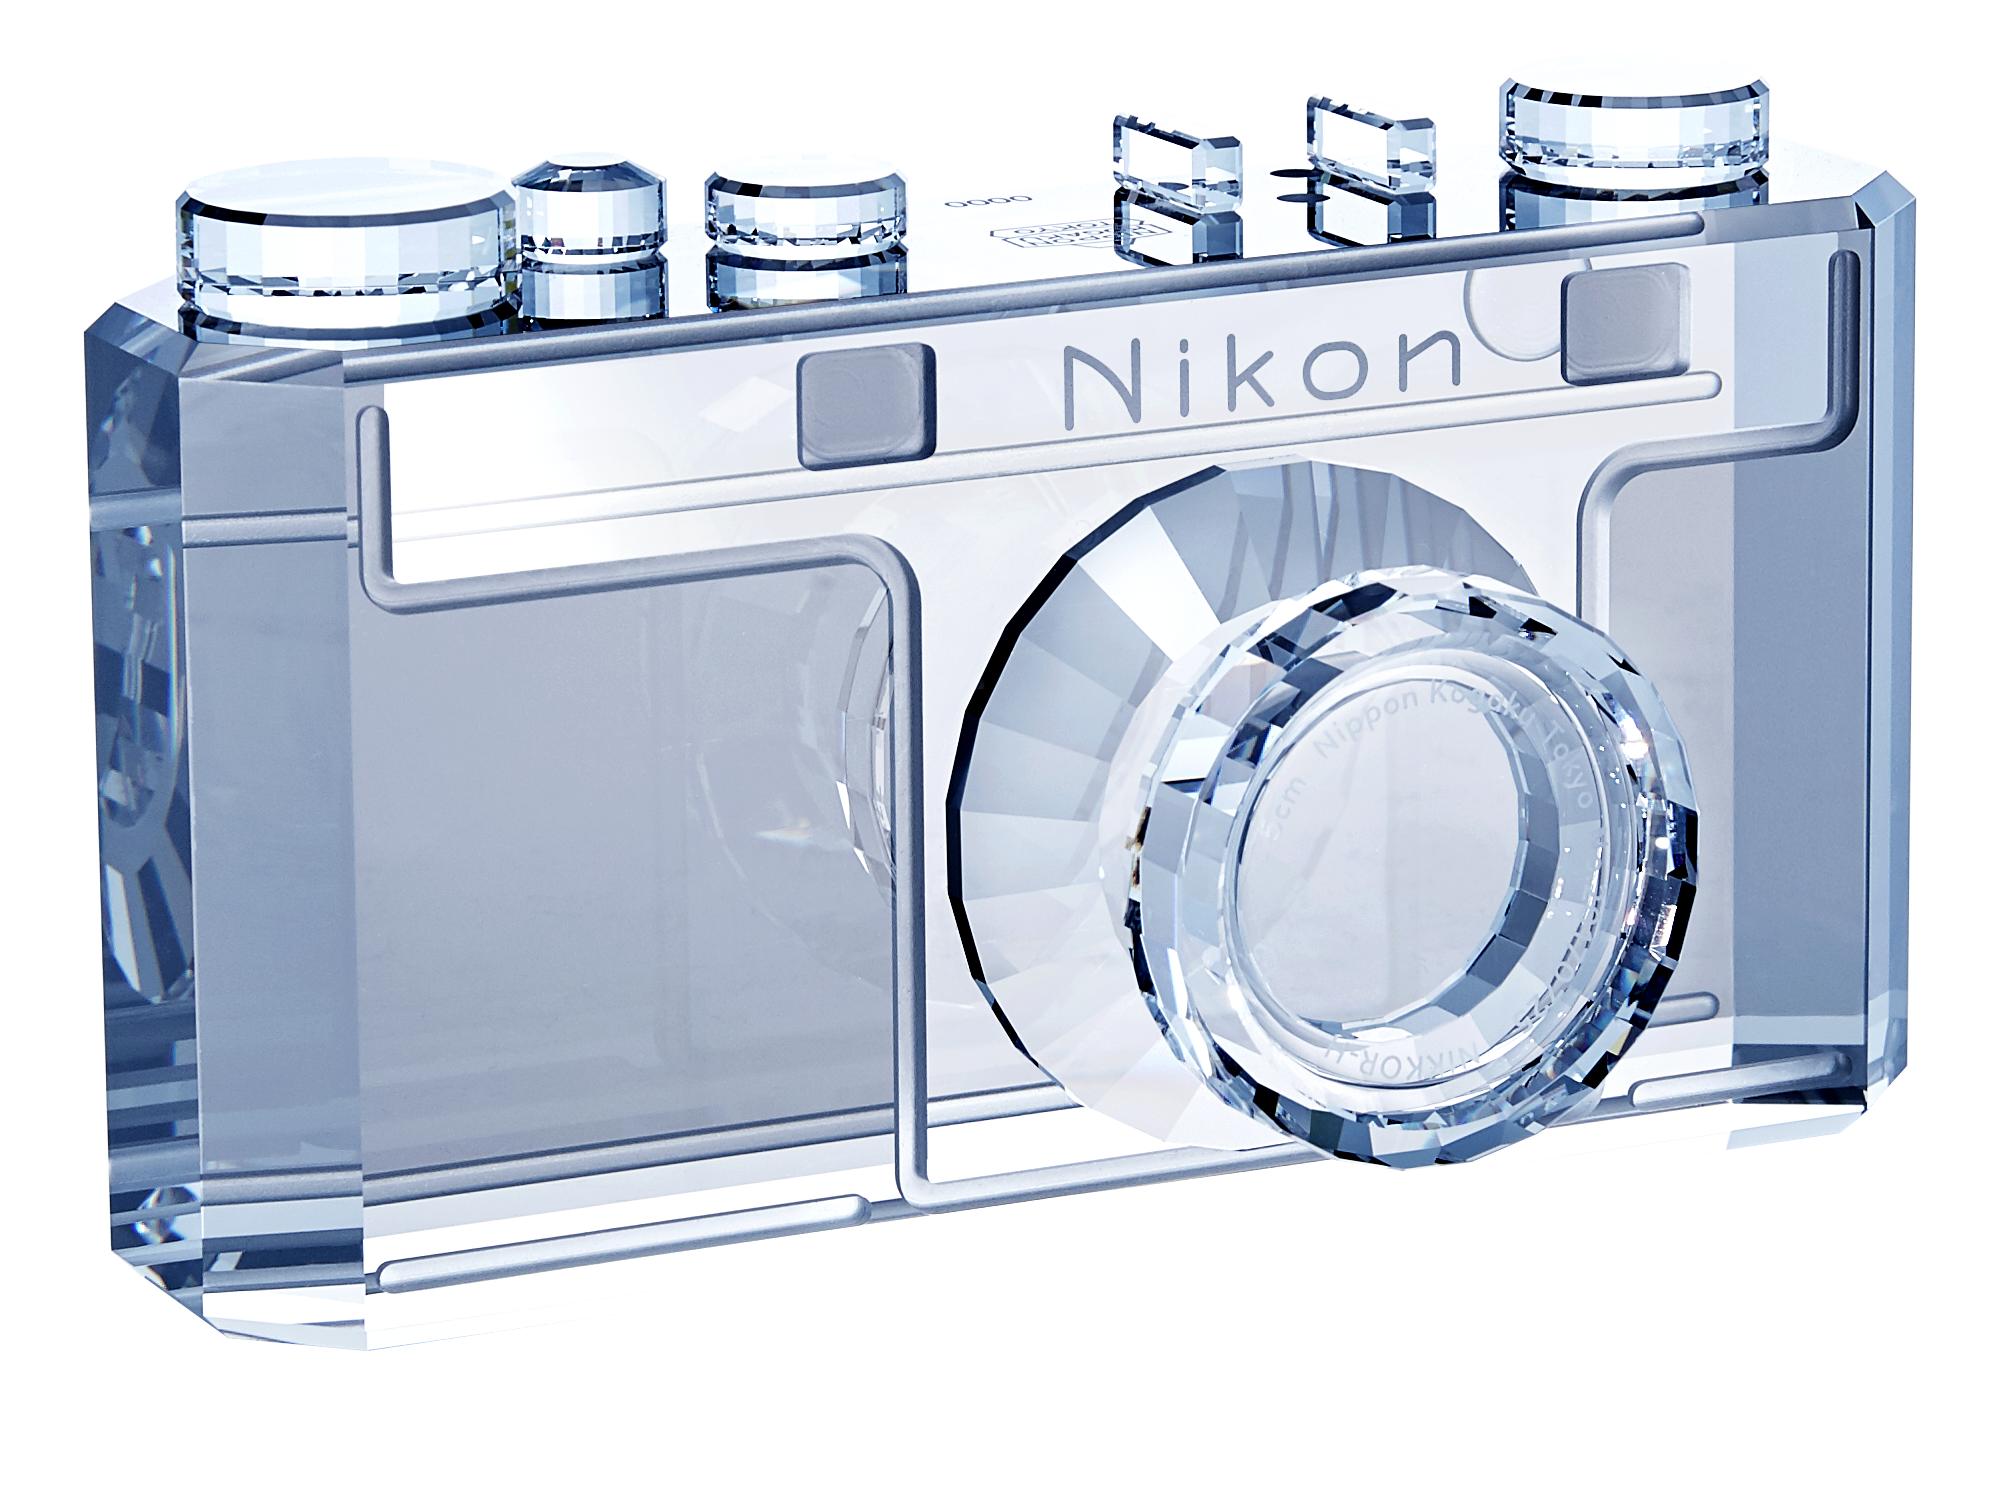 Nikon Модель камеры  I 100th Anniversary Swarovski®